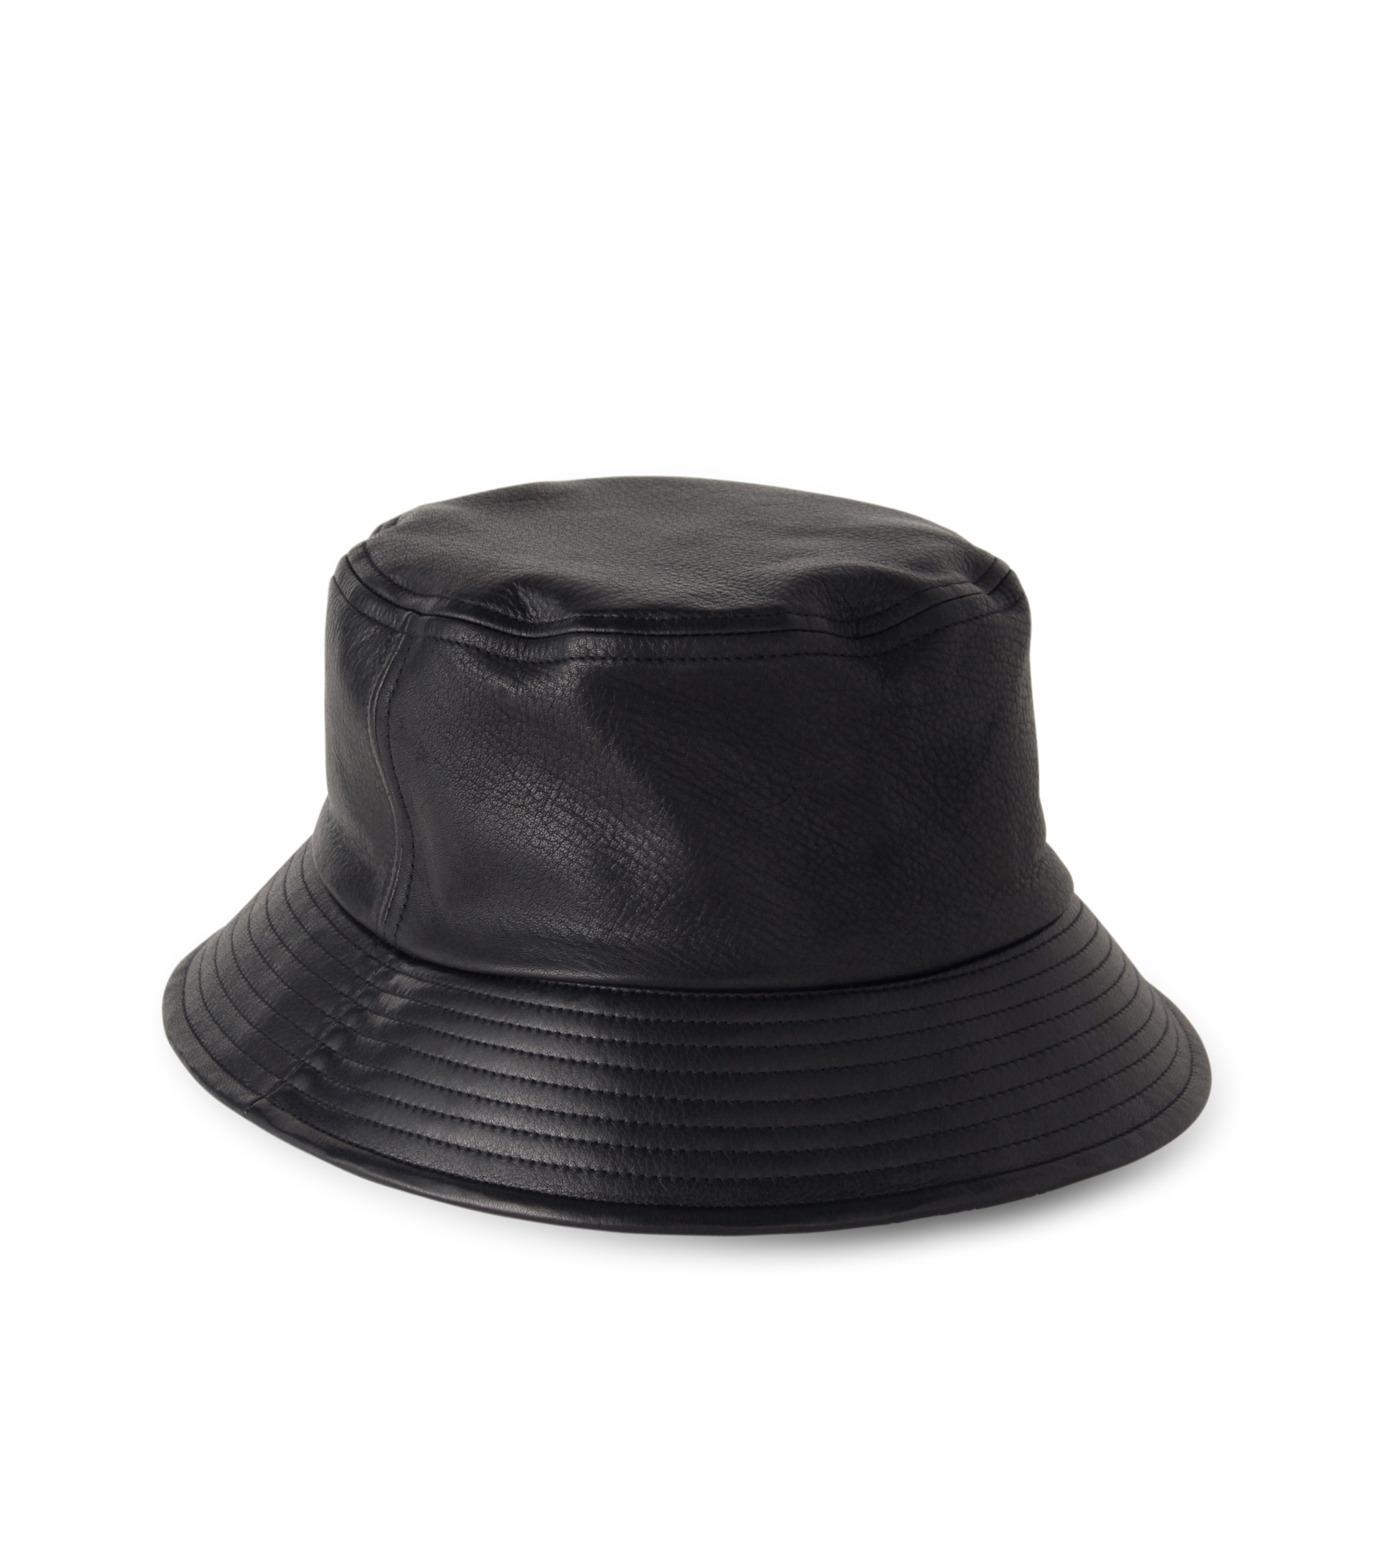 HL HEDDIE LOVU(エイチエル・エディールーヴ)のHL LEATHER BACKE-BLACK(キャップ/cap)-17A90003-13 拡大詳細画像2